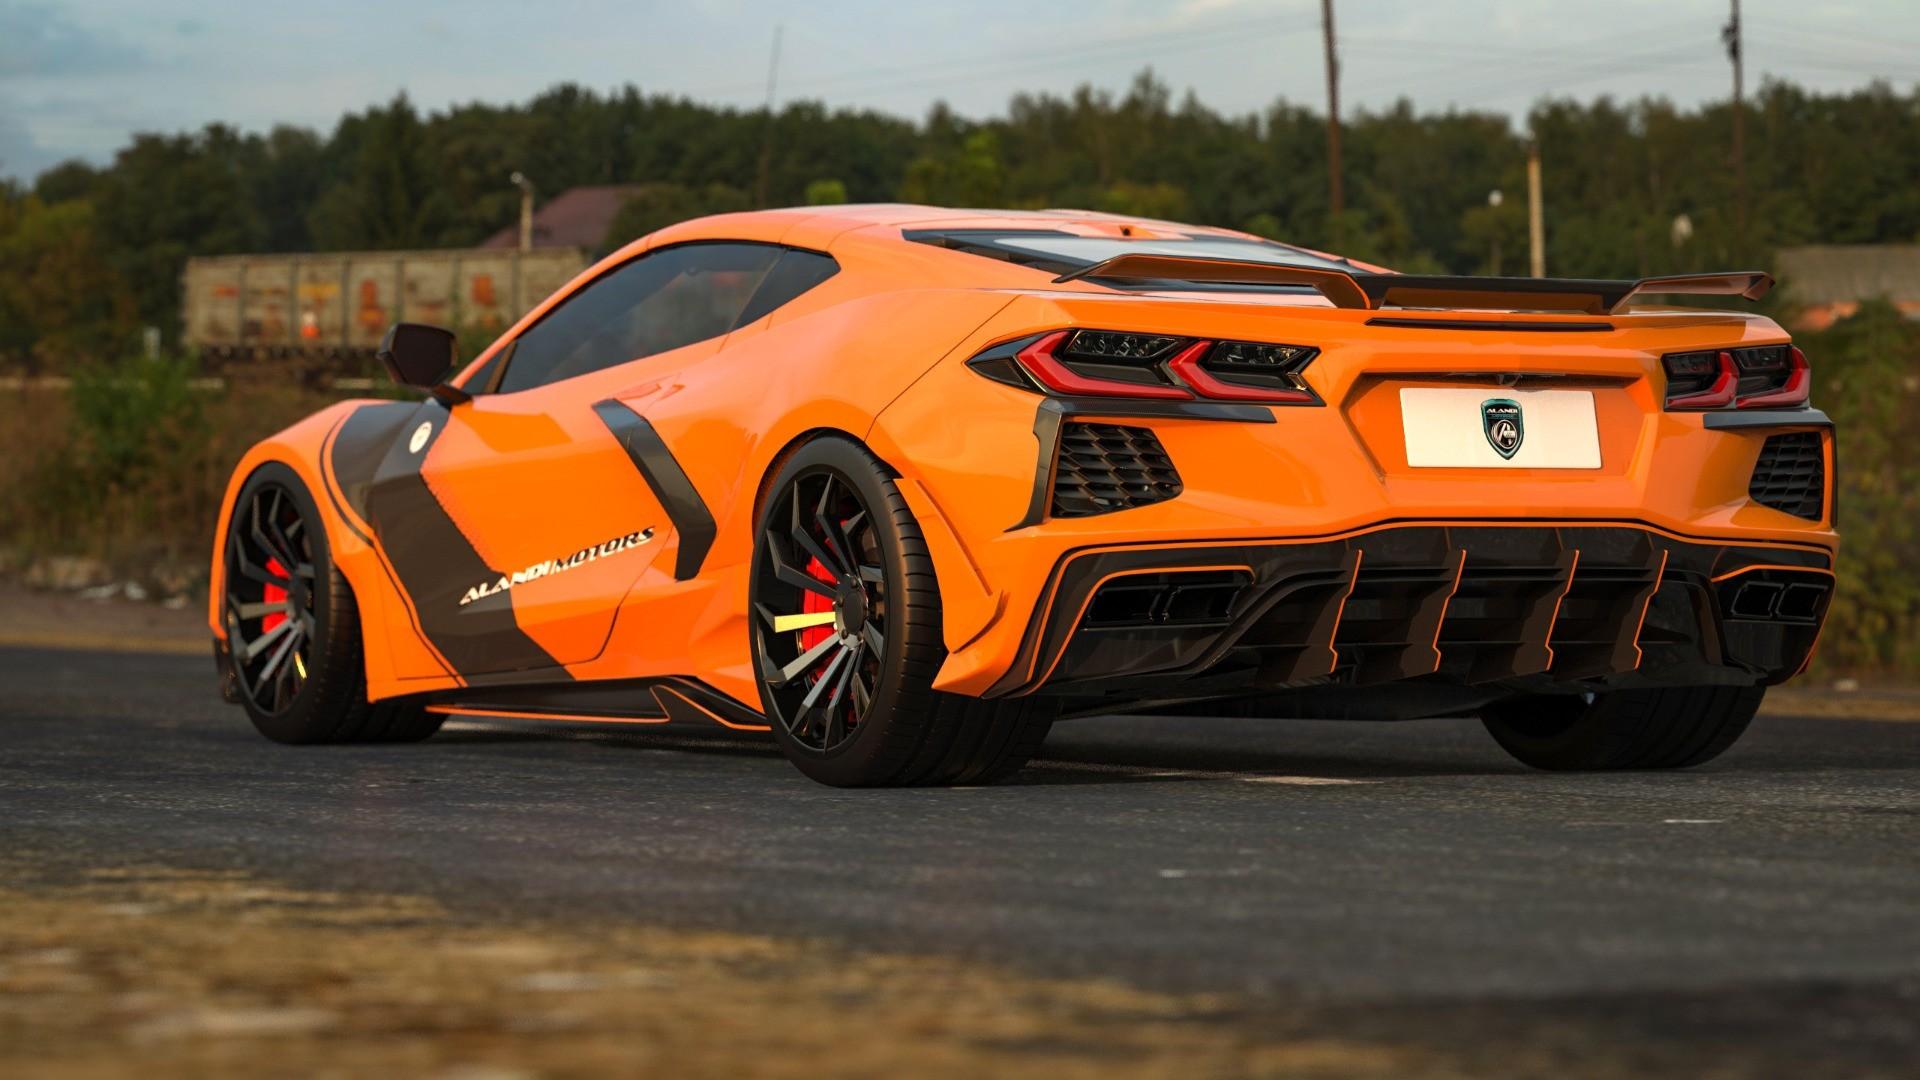 Chevrolet-Corvette-Centurion-by-Alandi-Motors-20